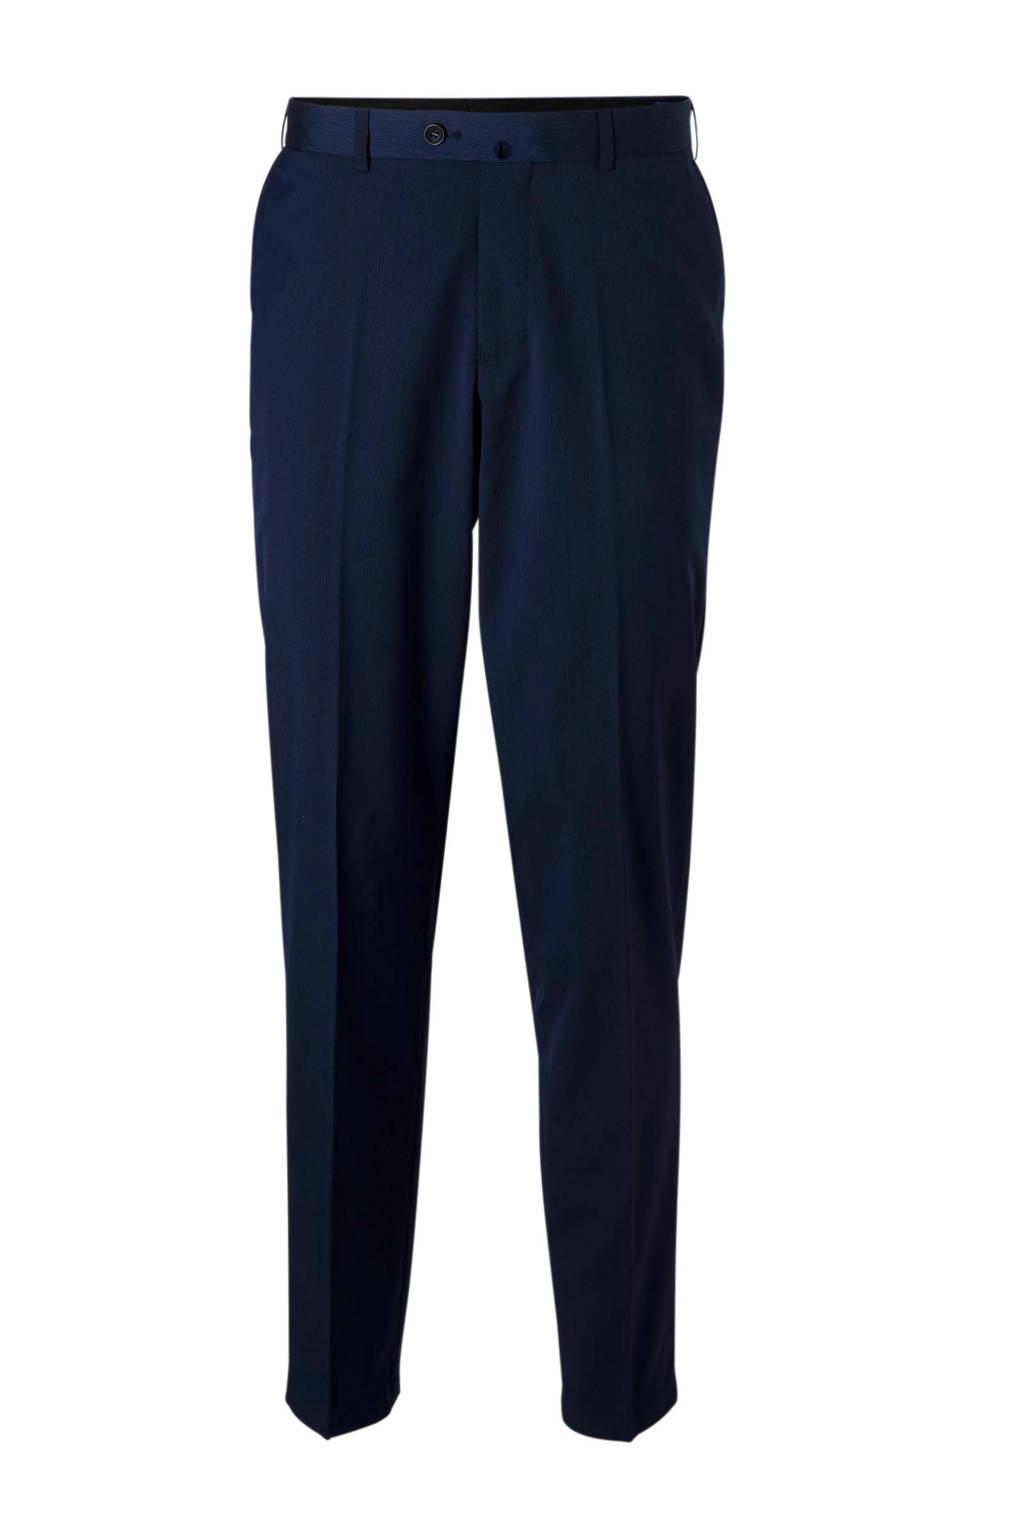 C&A Angelo Litrico pantalon slim fit, BRIGHTBLUE-STRIPE